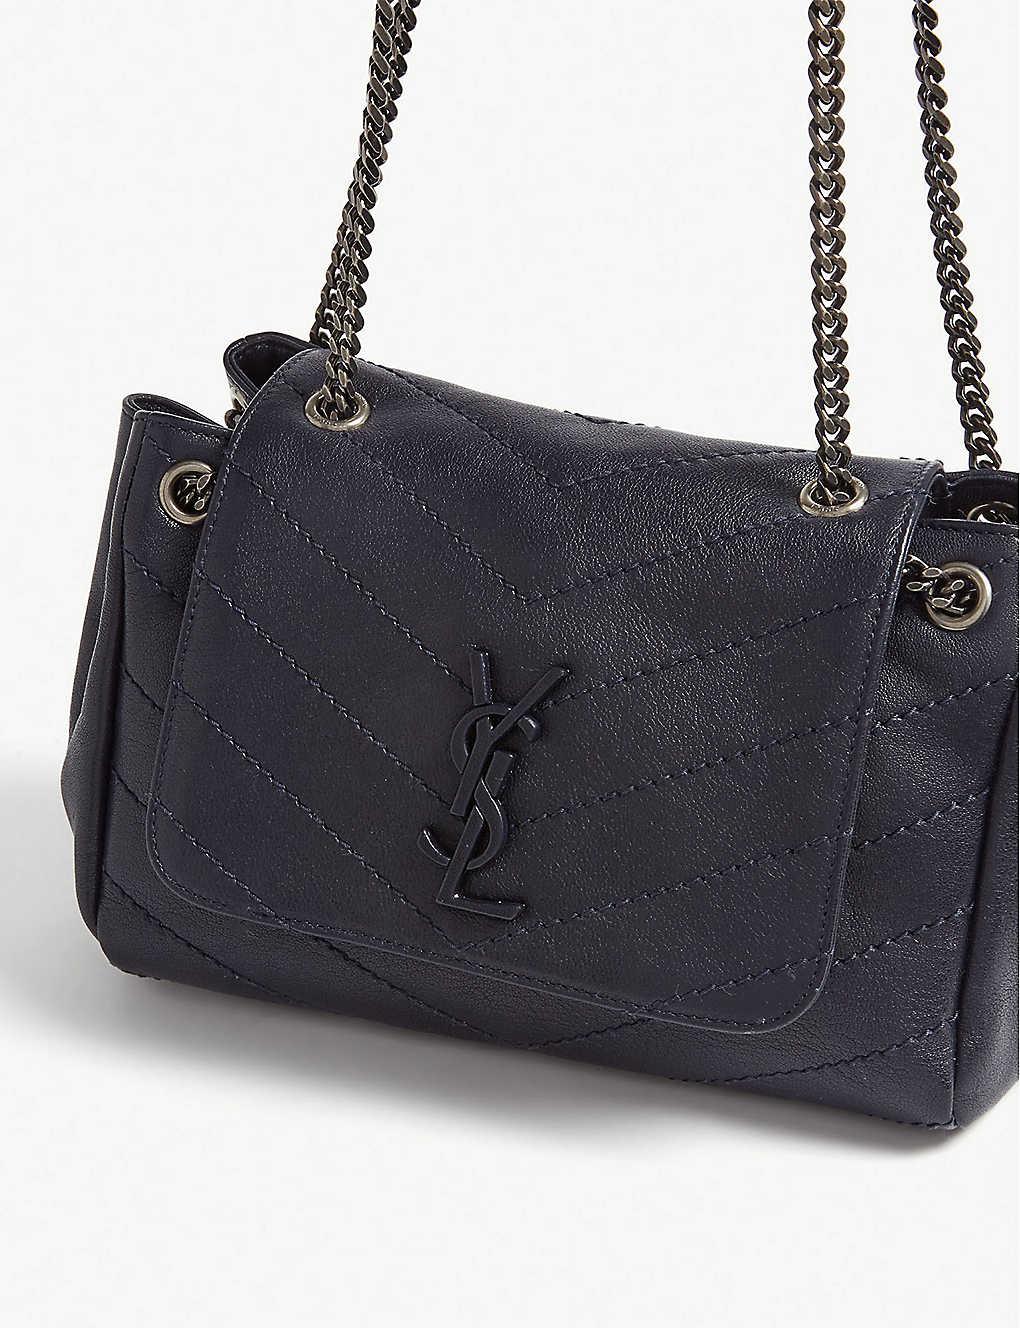 e7ef73d708 ... Nolita monogram small leather shoulder bag - Midnight blue zoom